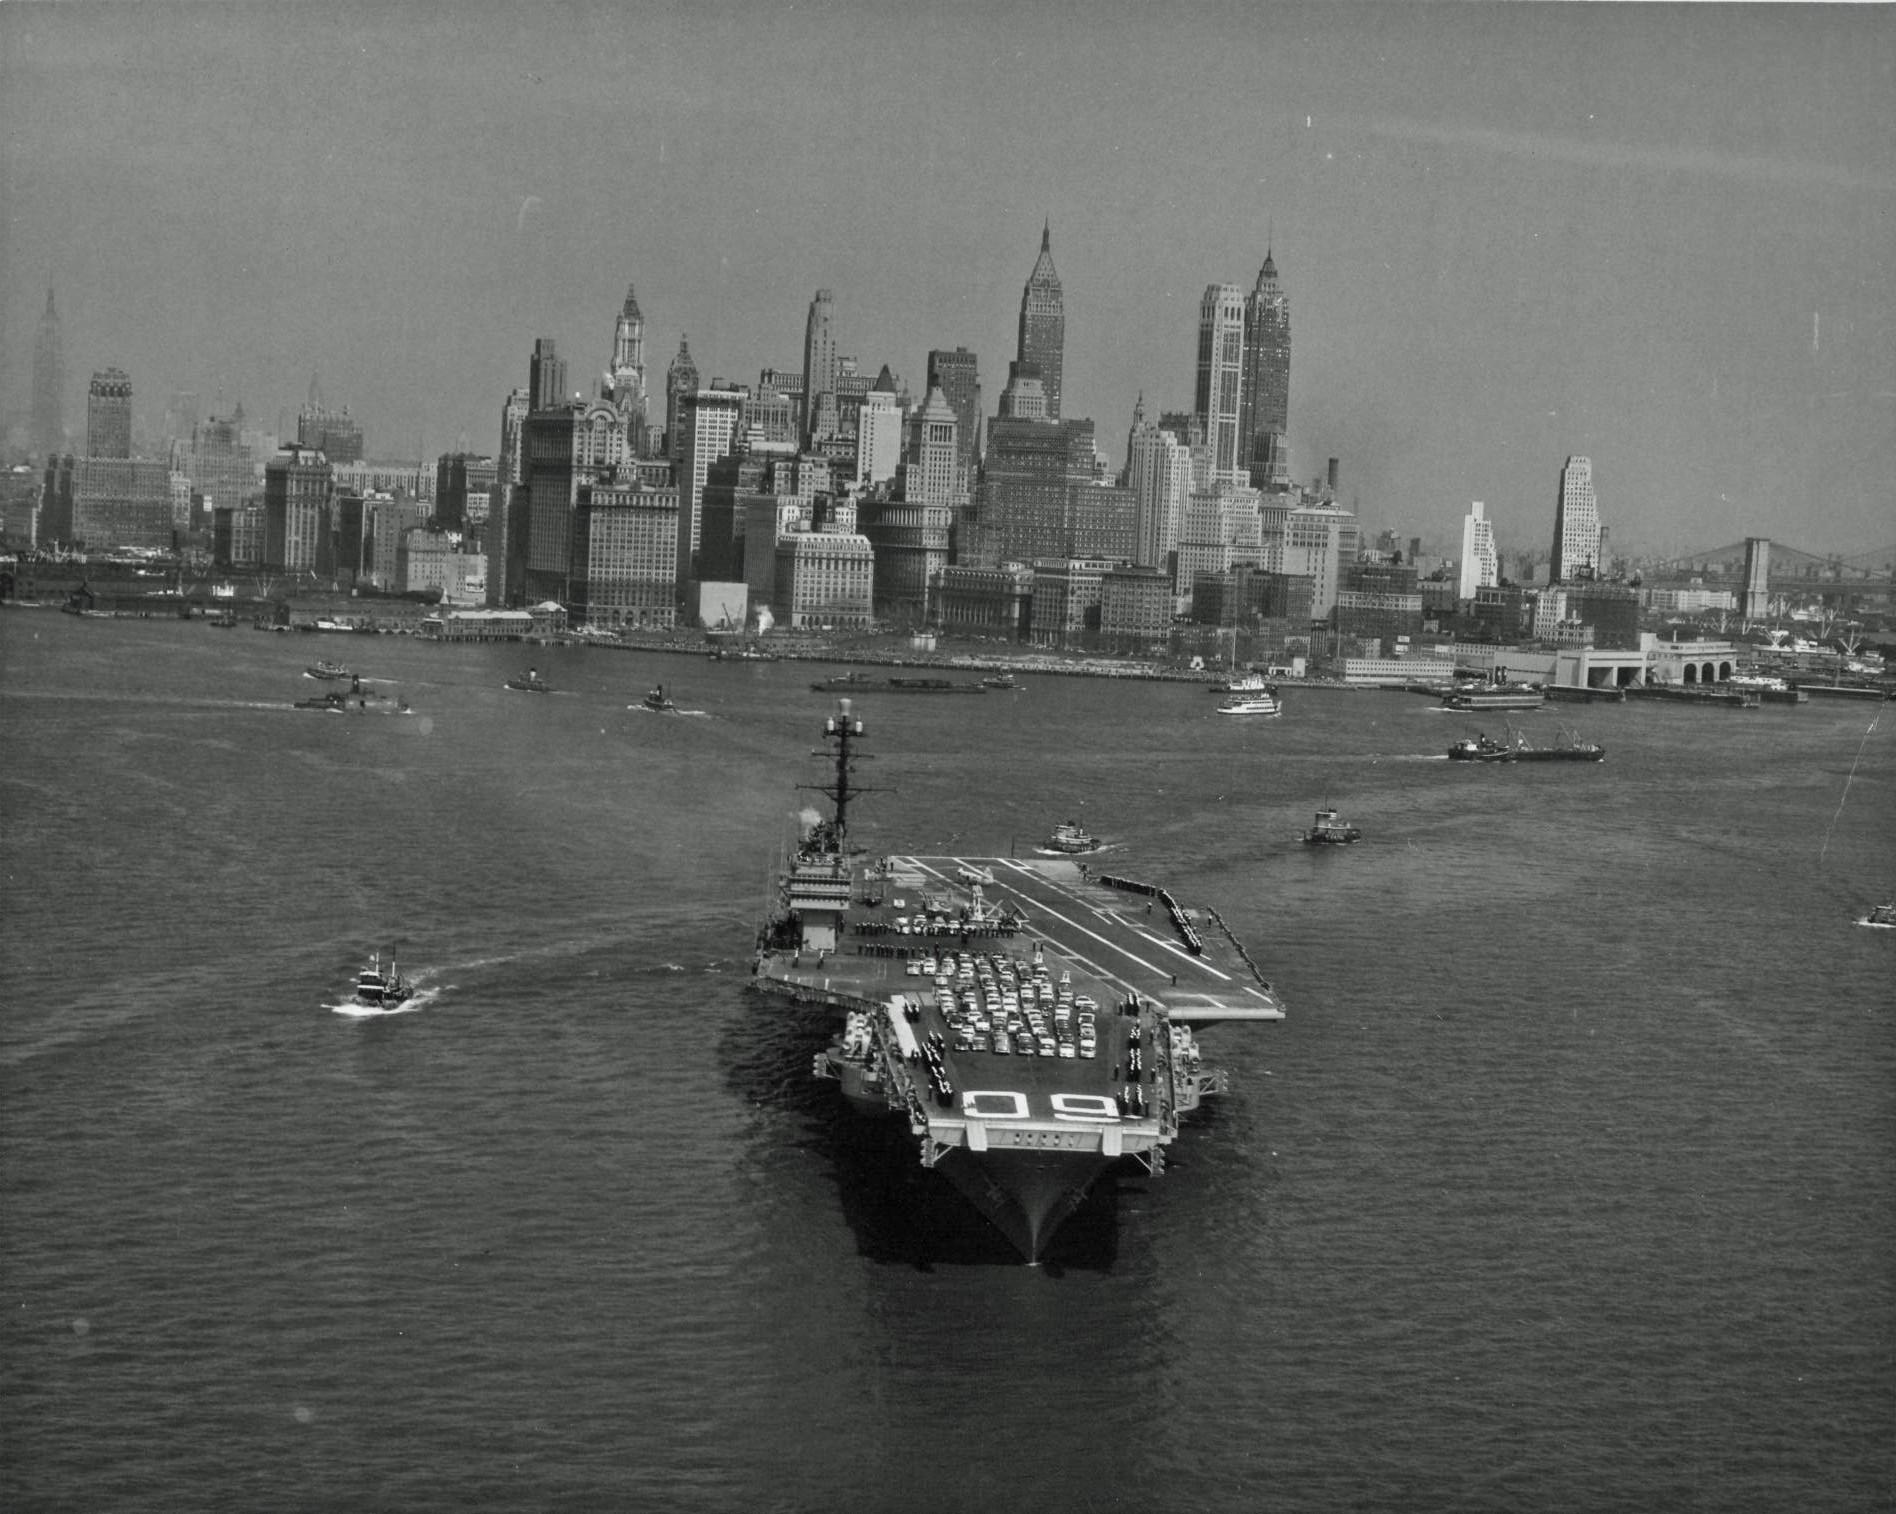 New York circa 1940s